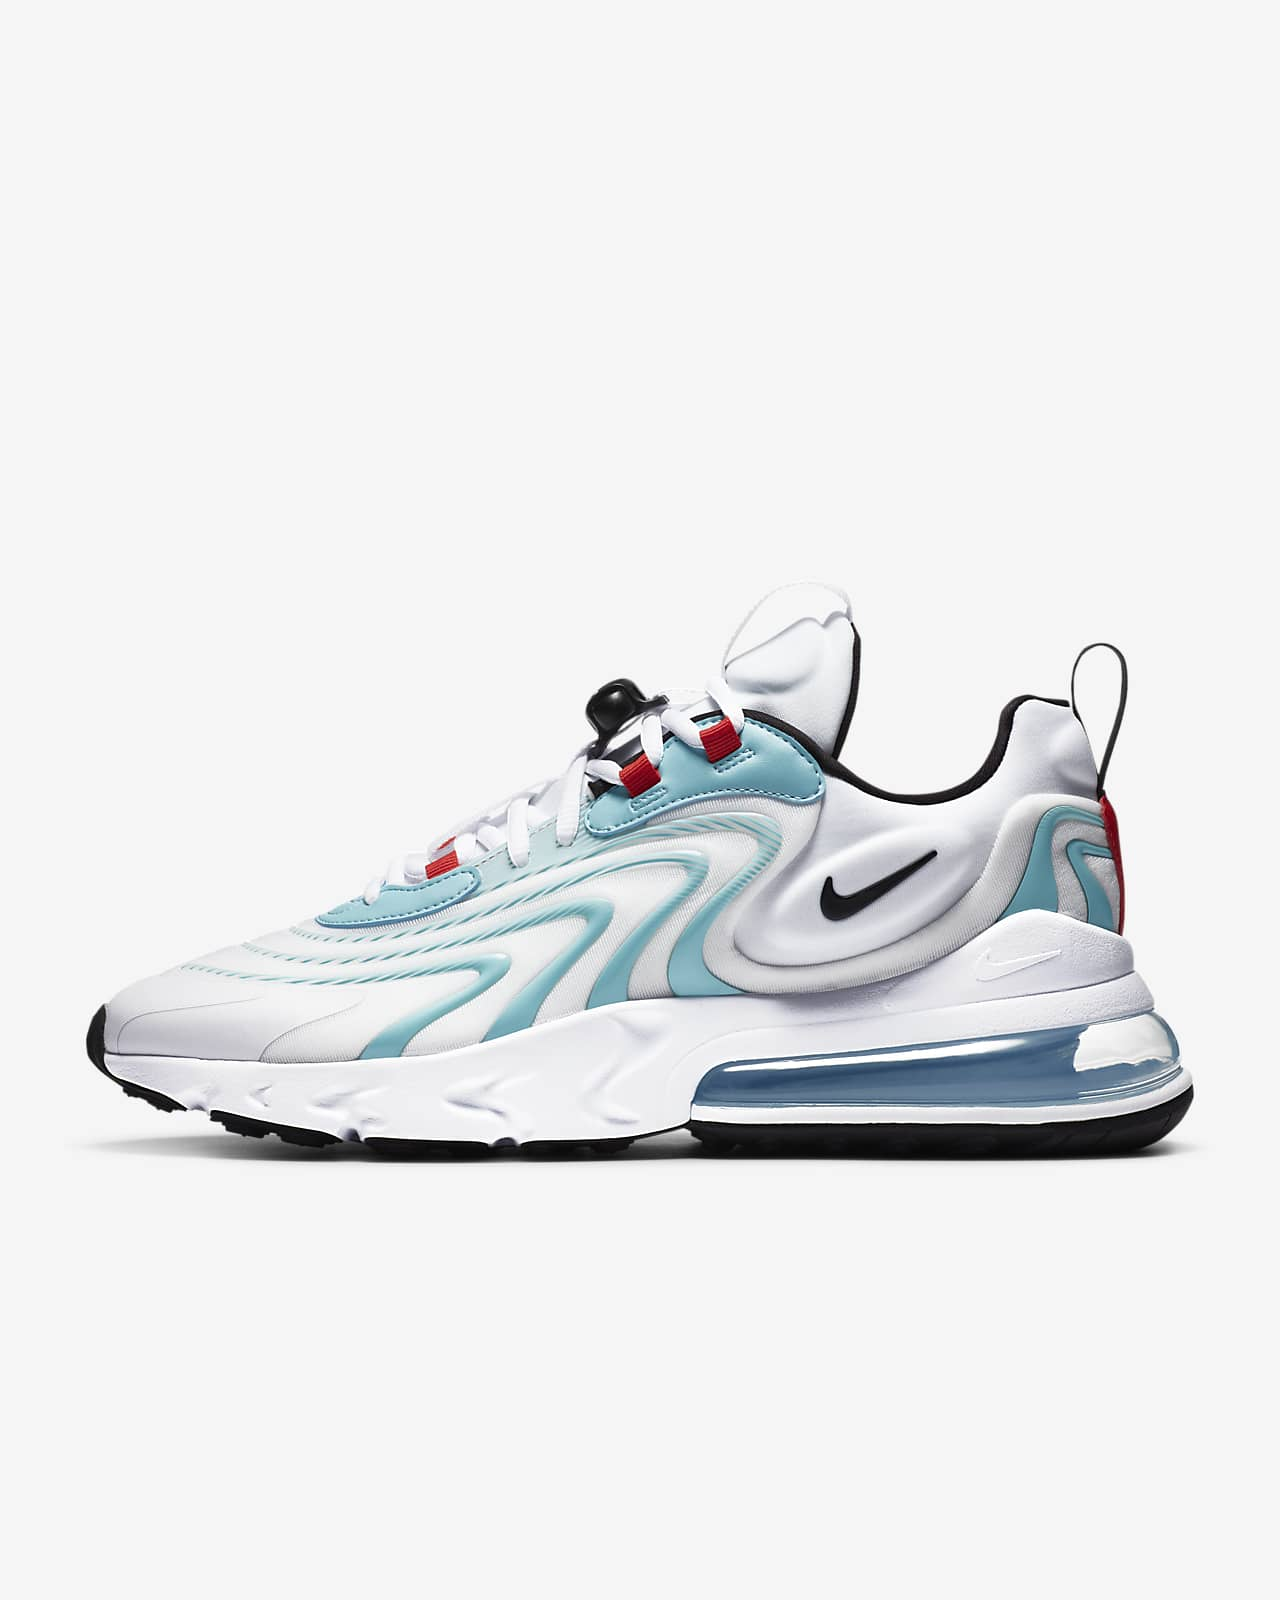 La spesa amico pelliccia  Scarpa Nike Air Max 270 React ENG - Uomo. Nike IT